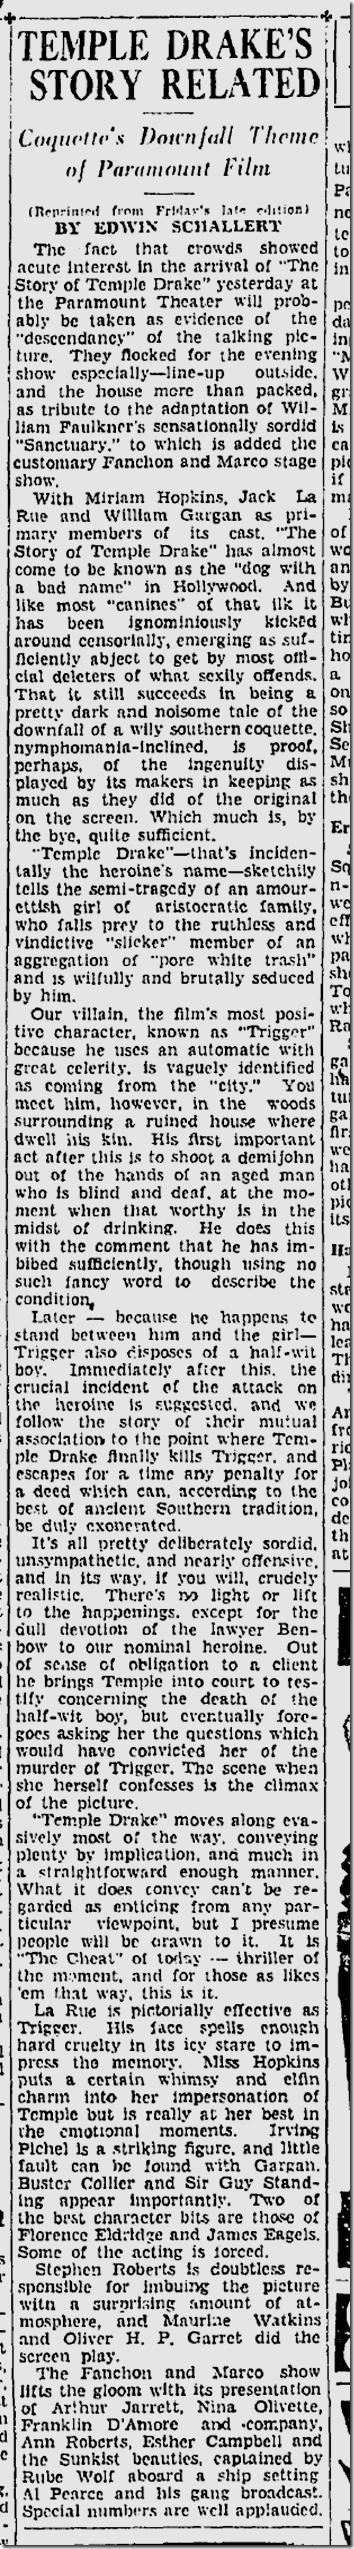 June 3, 1933,